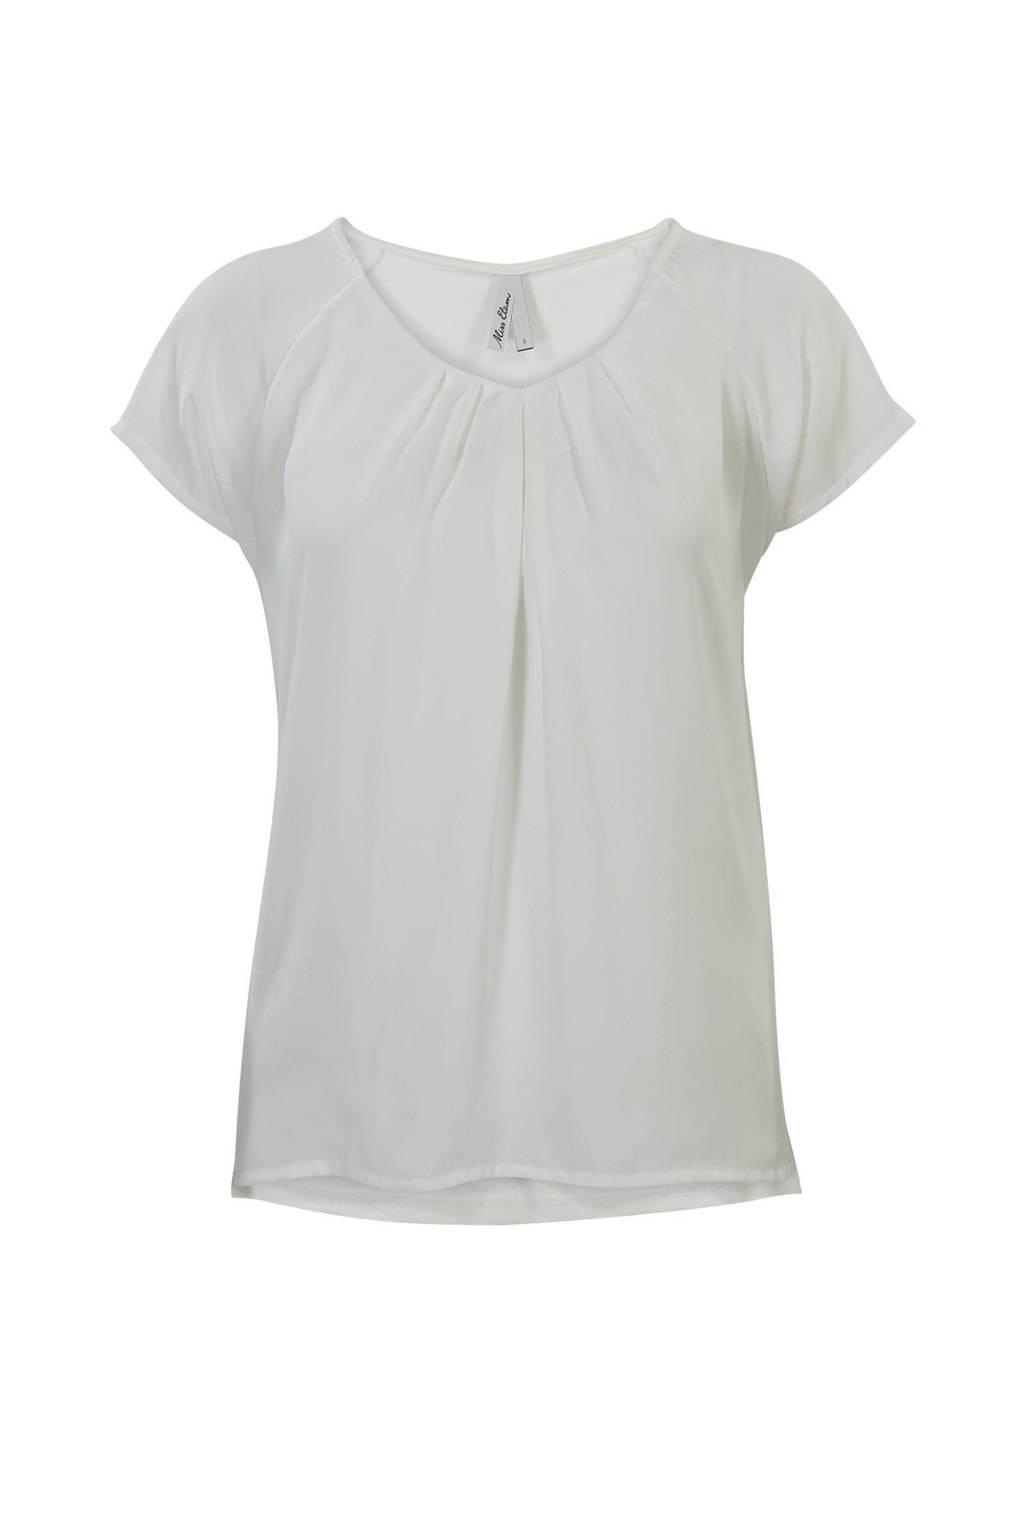 Miss Etam Regulier T-shirt, naturel wit